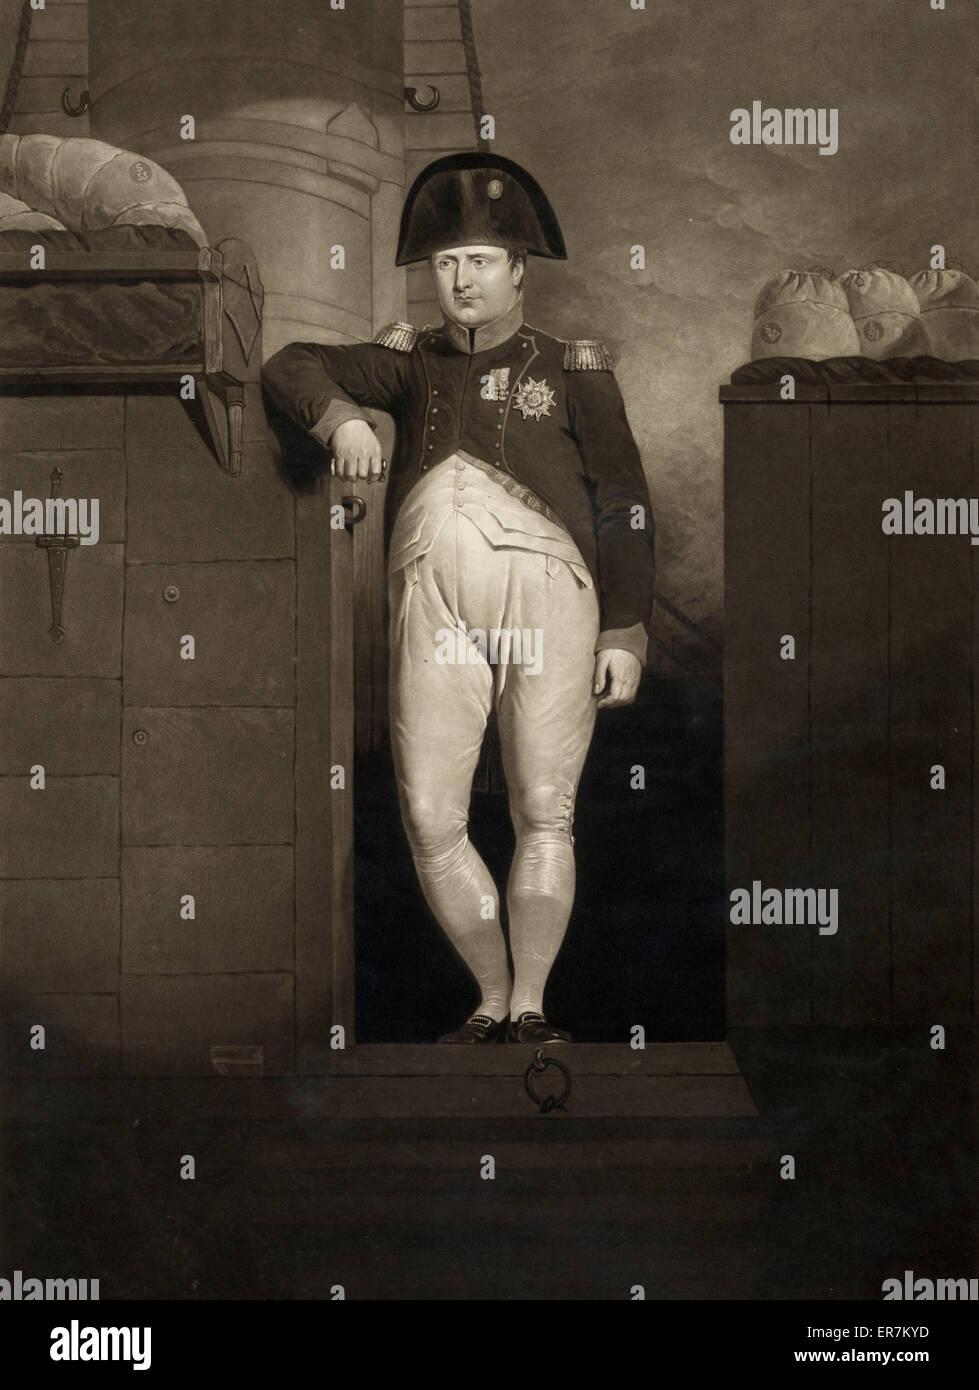 Napoleon Bonaparte plump ship (?) - Stock Image